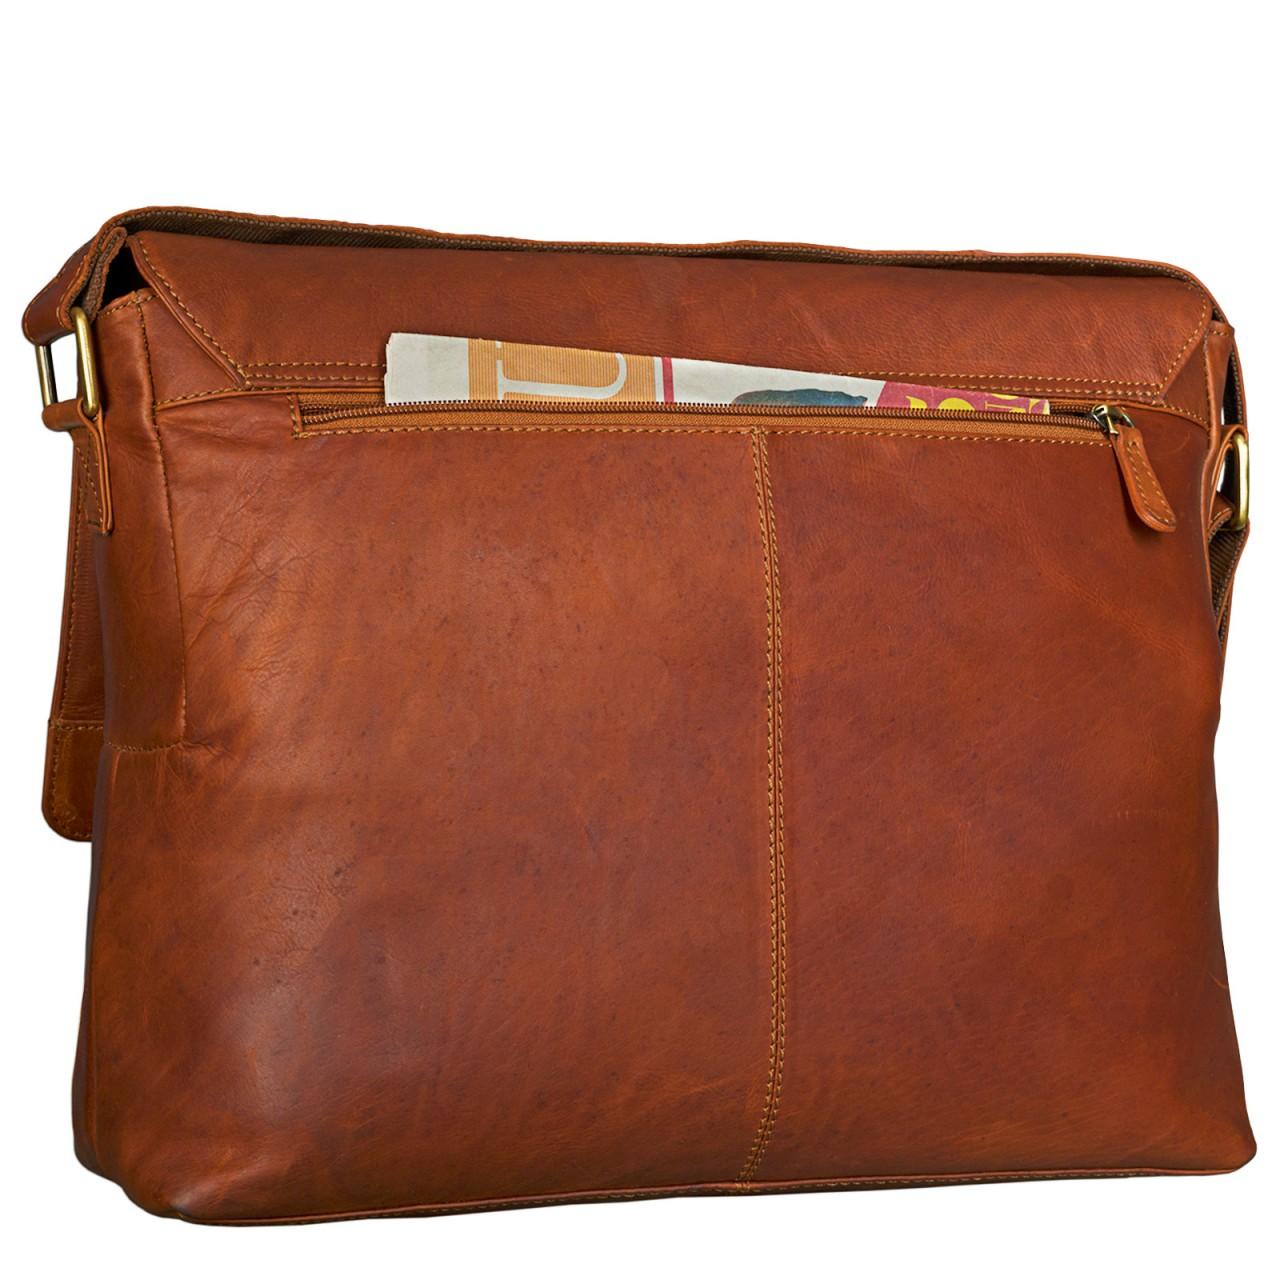 STILORD Messenger Bag Leder Herren Damen Arbeitstasche DIN A4 Dokumententasche Akten Büro Uni Freizeit für 15,6 Zoll Laptop Büffelleder Cognac - Bild 8